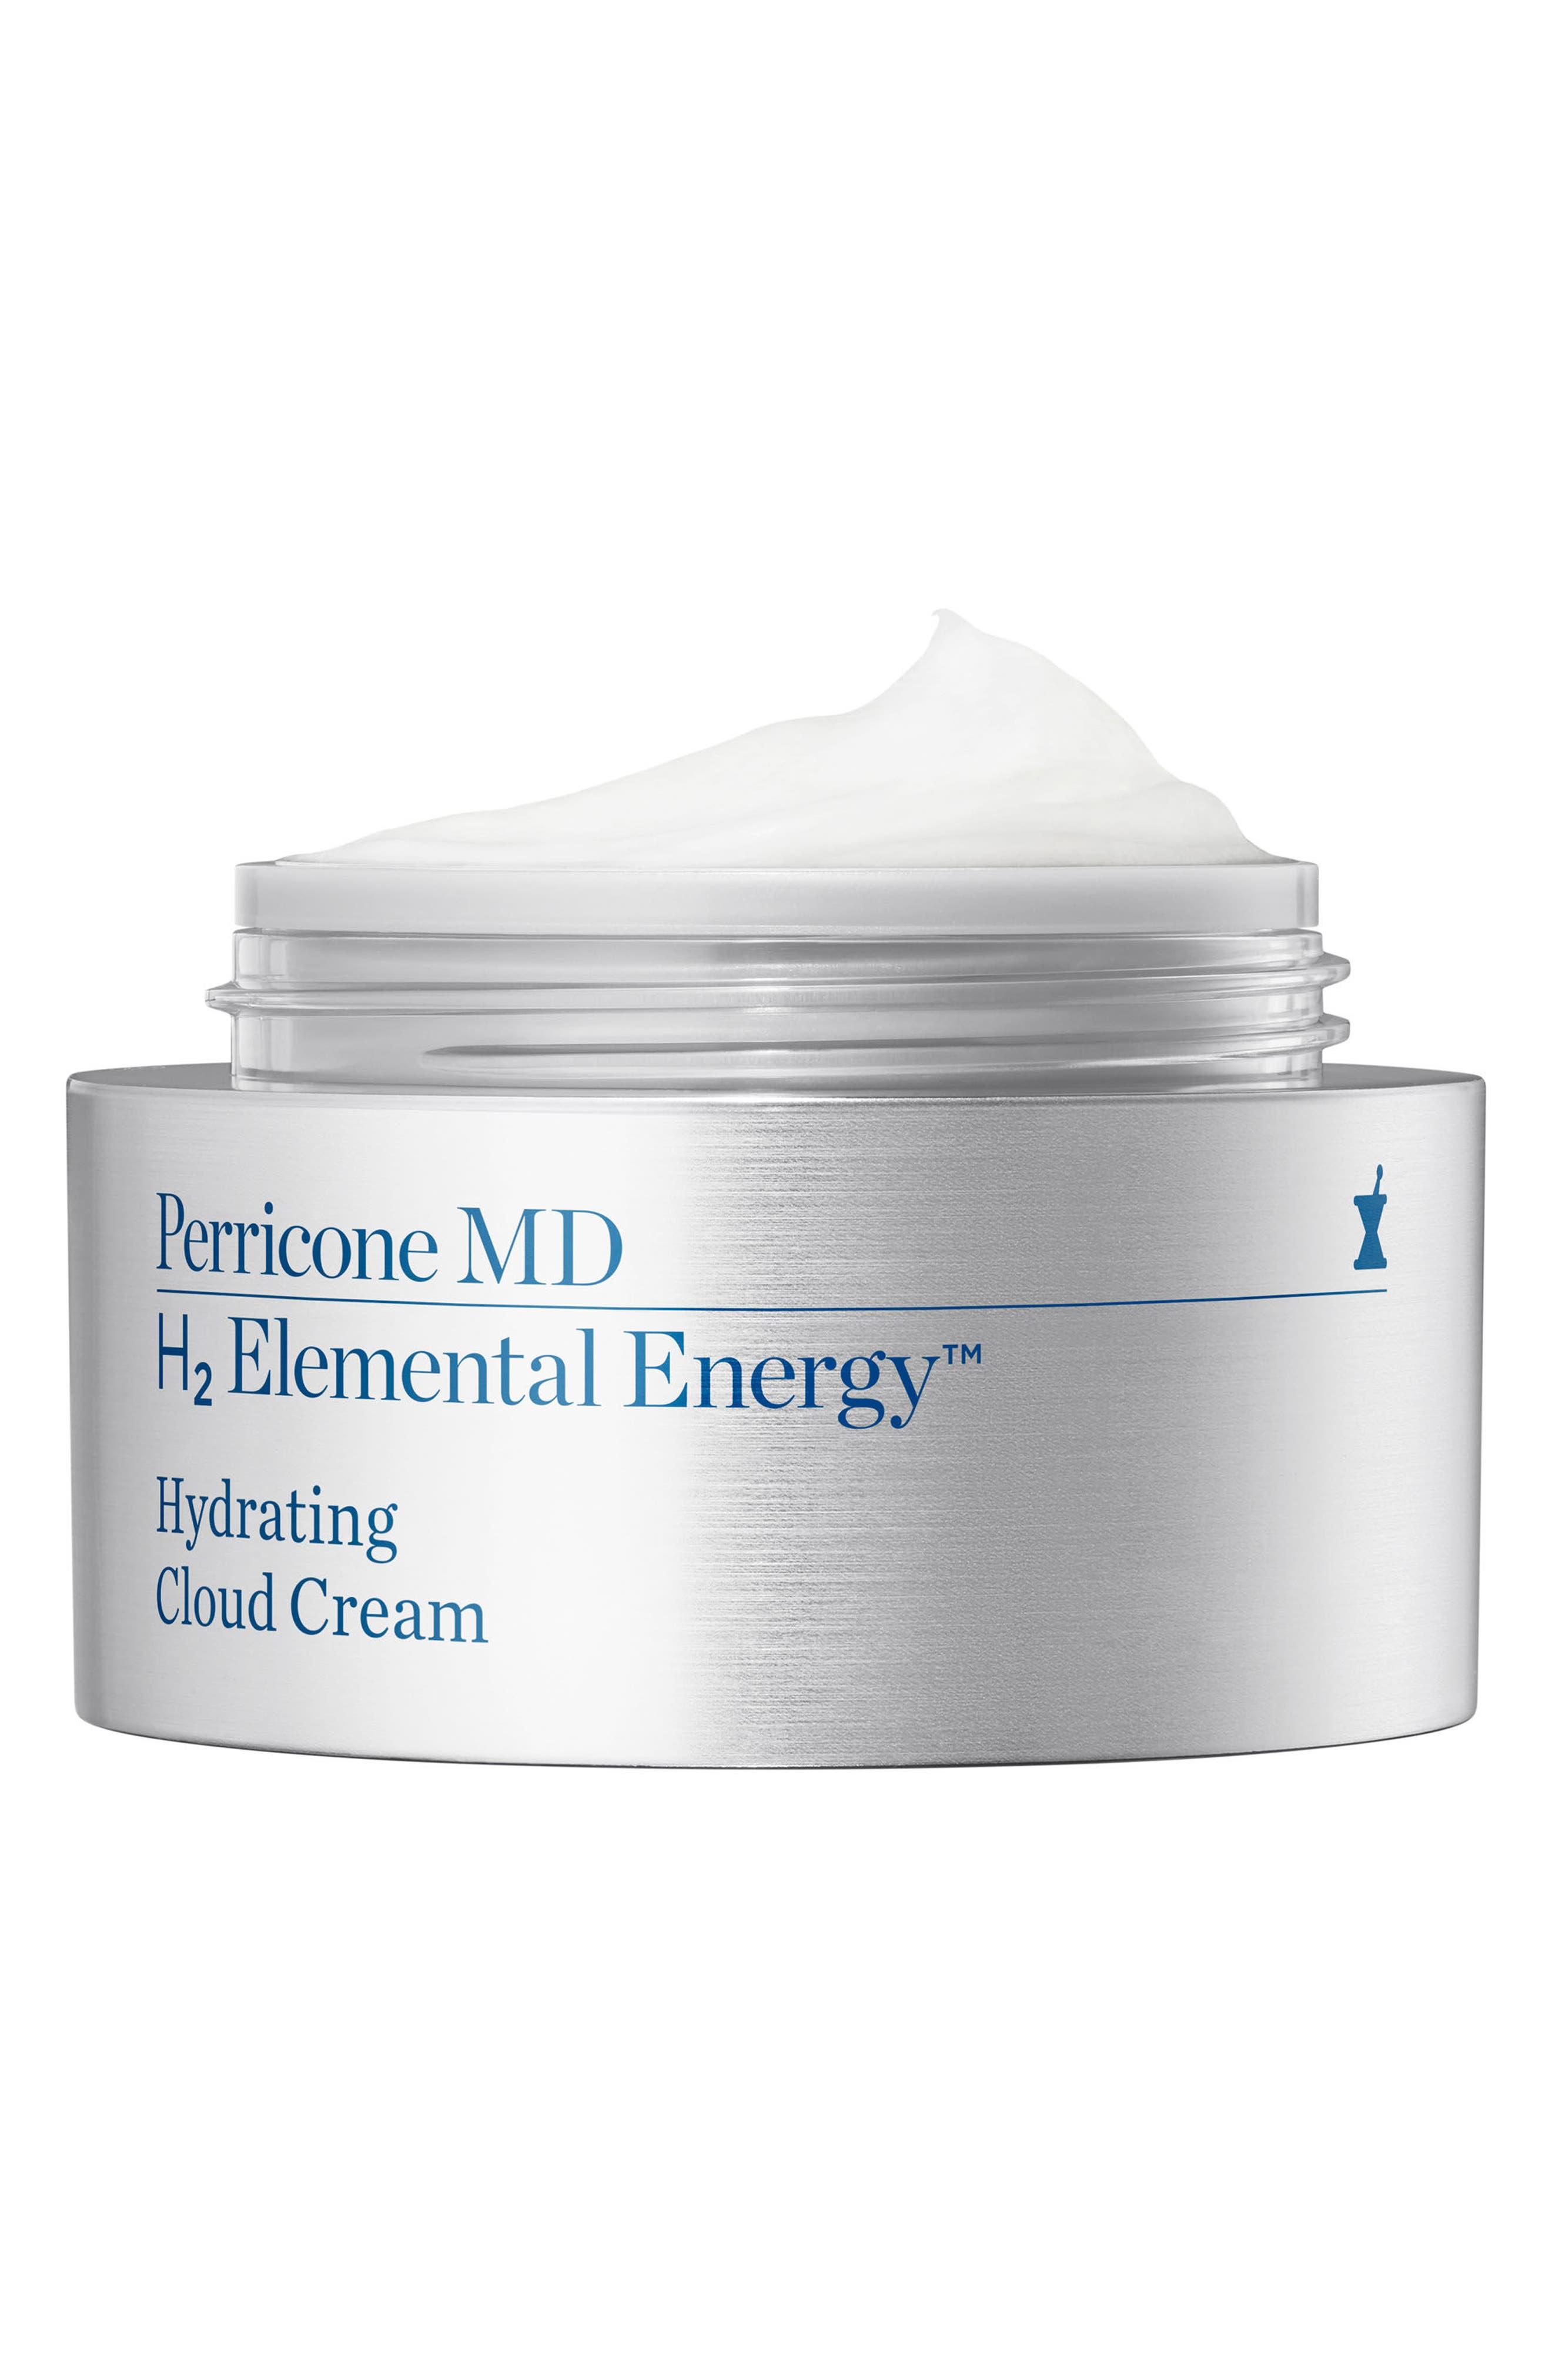 H2 Elemental Energy Hydrating Cloud Cream,                             Alternate thumbnail 5, color,                             000